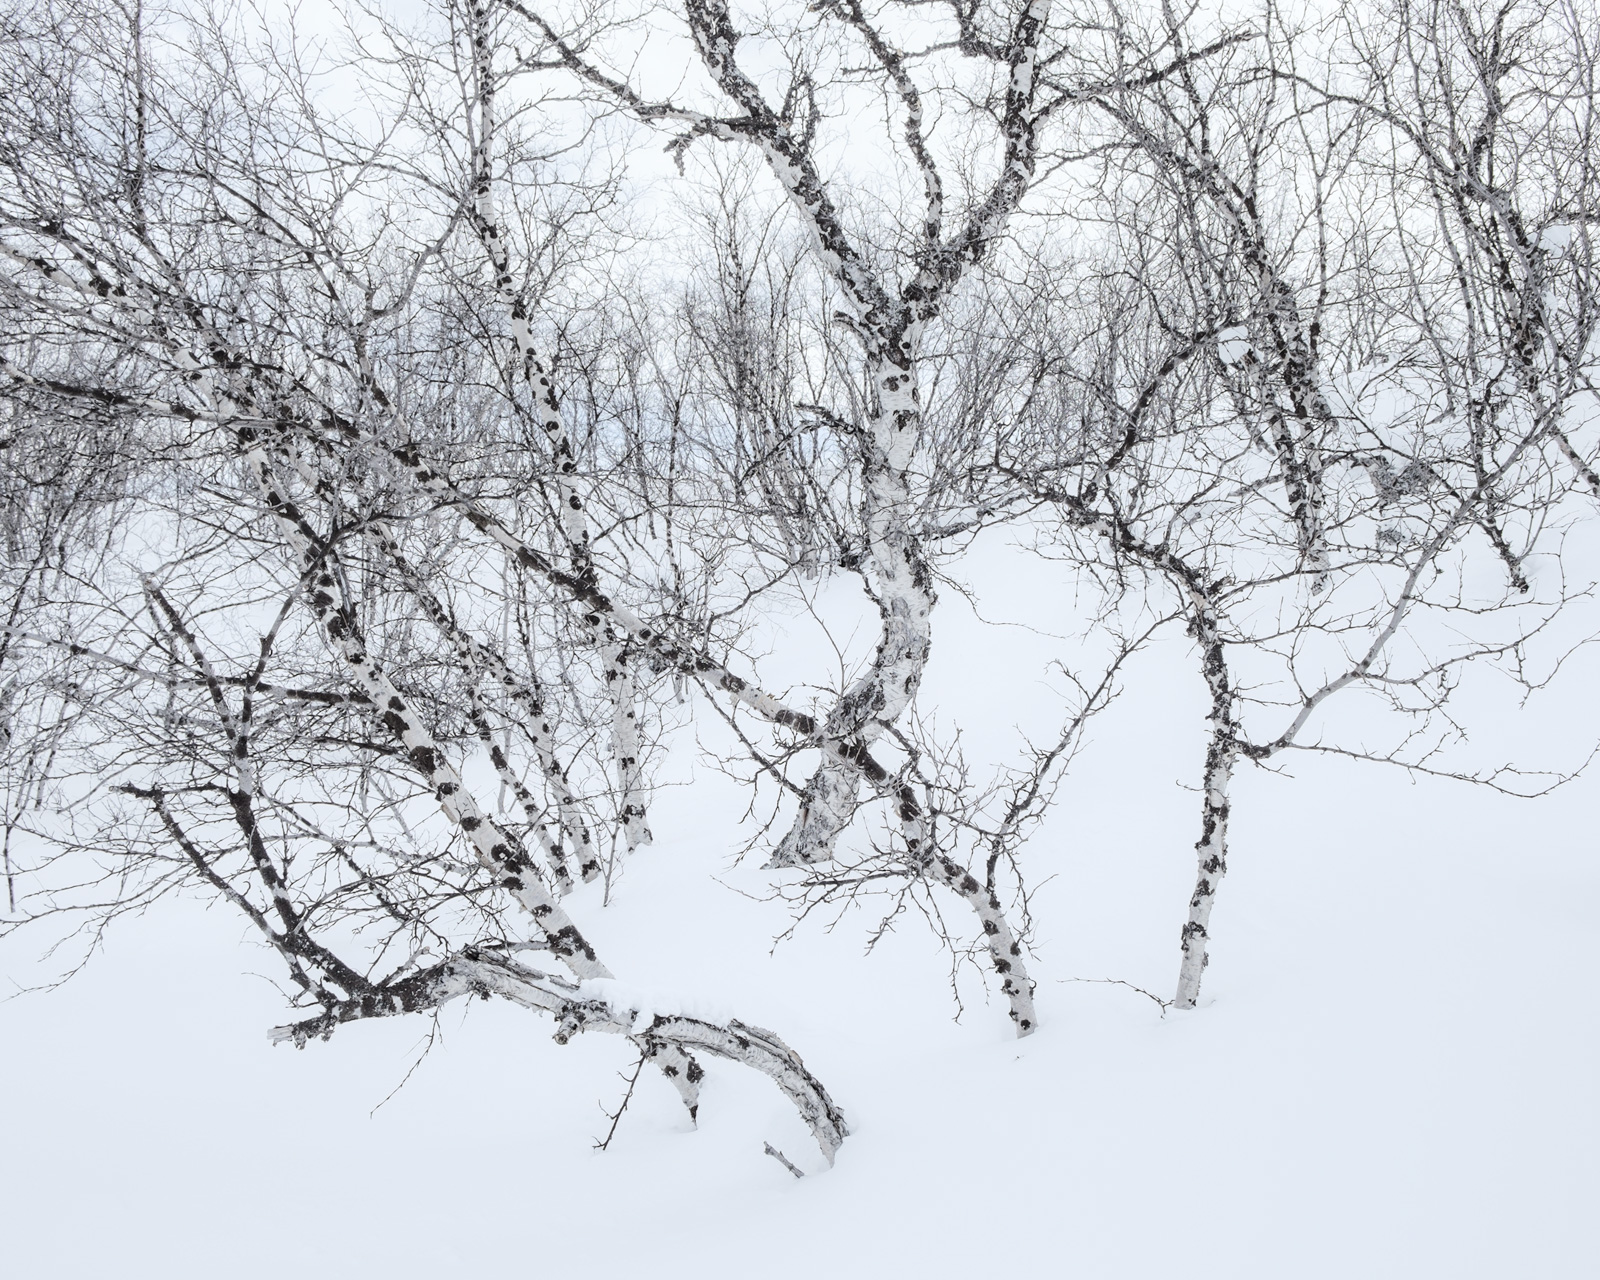 Arctic birch tango, Abisko. Fuji X-E2, Fuji 18-55mm at 20.5mm, ISO 200, 1/280s at f/7.1, handheld. March. © Lizzie Shepherd